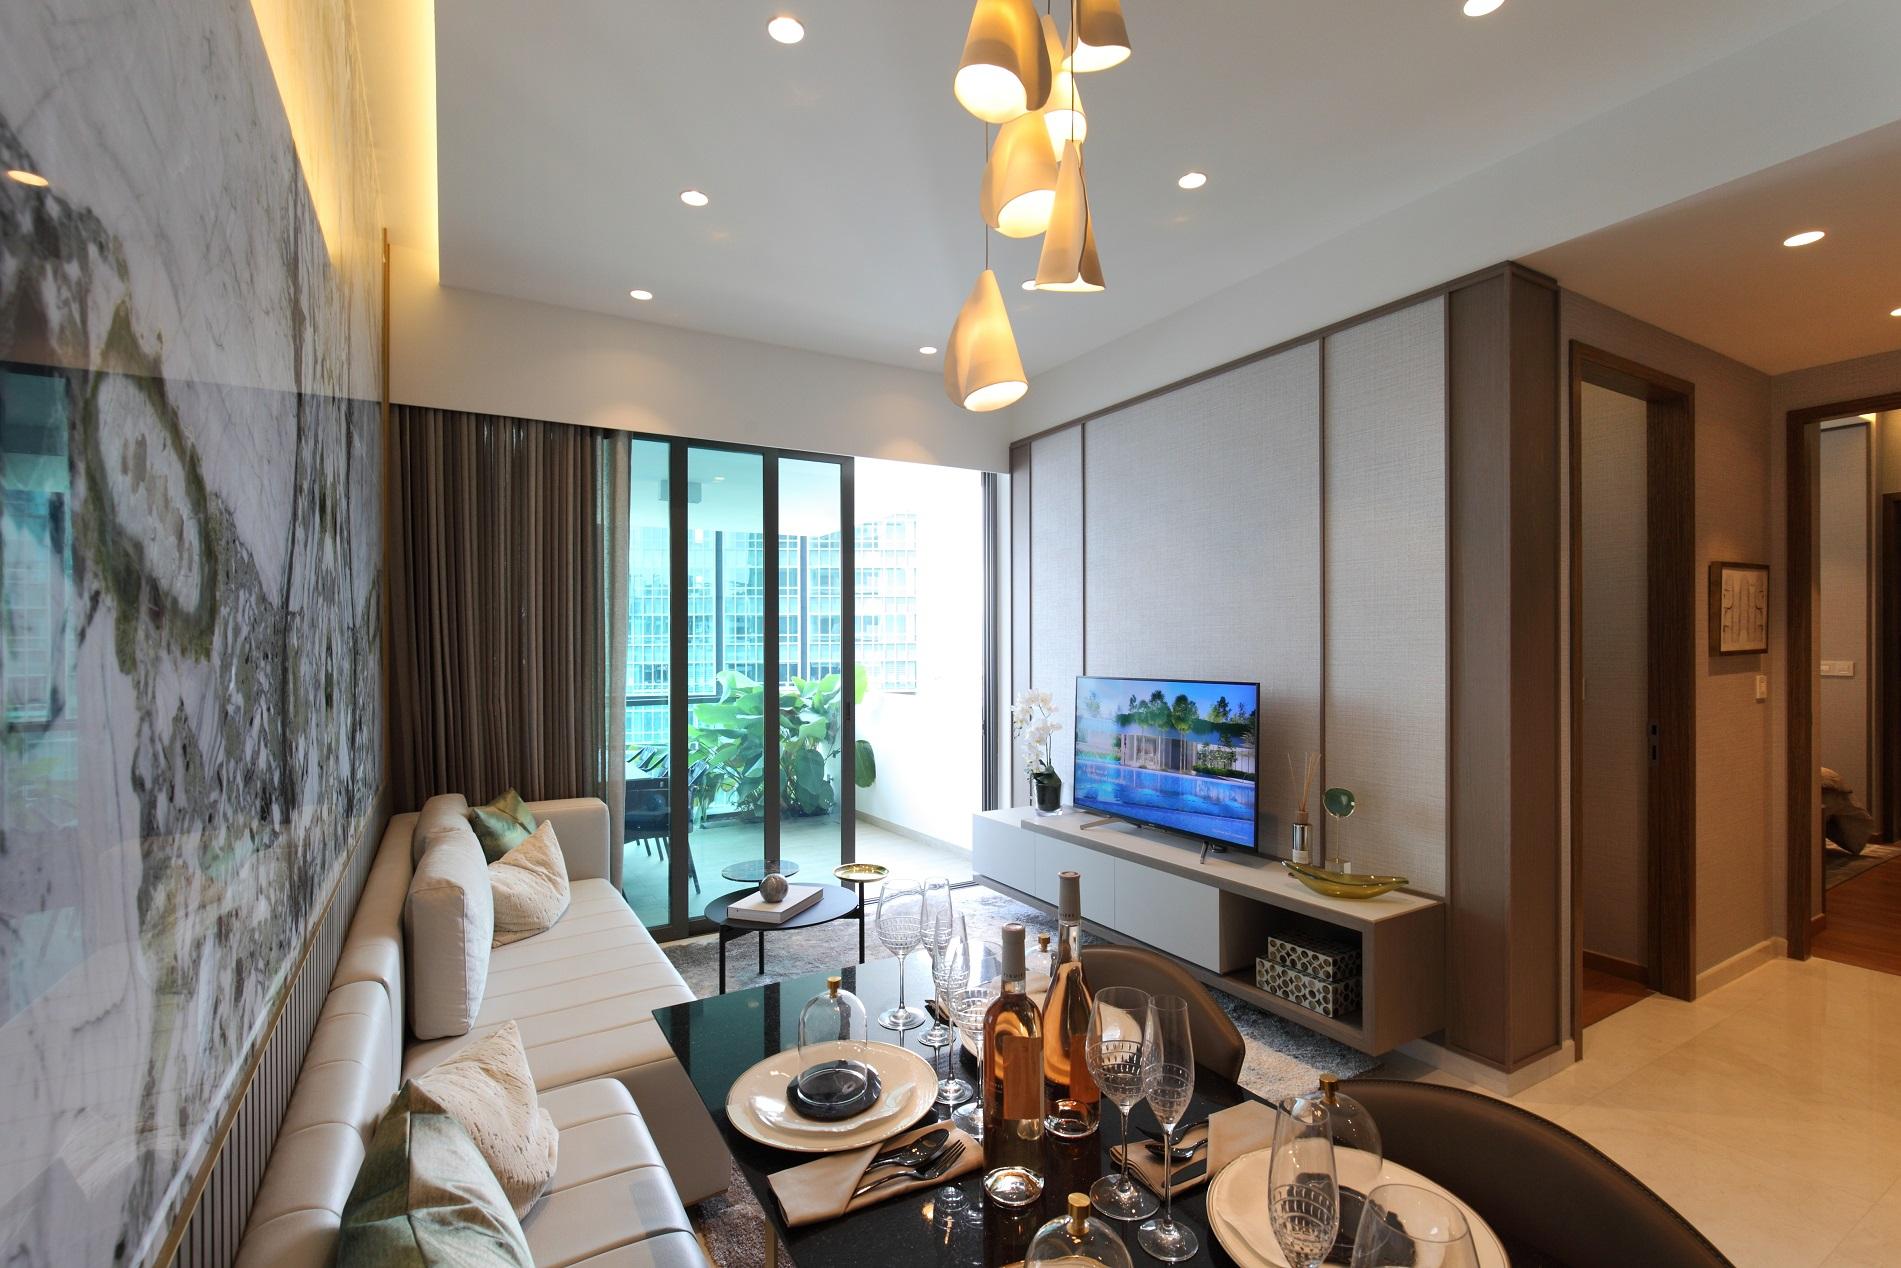 8 Saint Thomas living room - EDGEPROP SINGAPORE